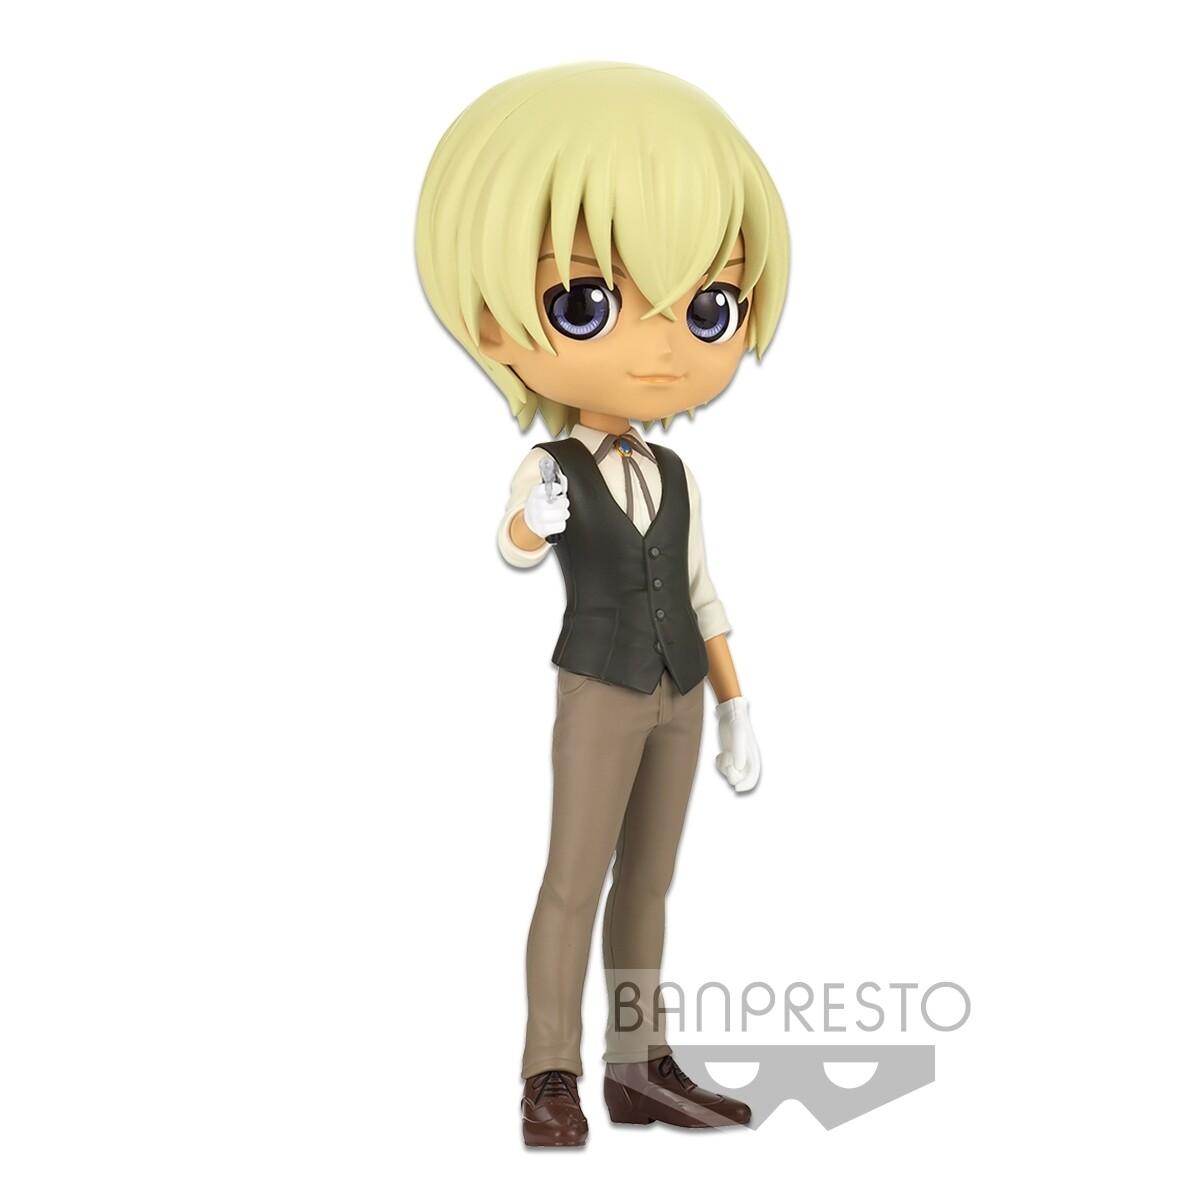 PRE-ORDER Banpresto Detective Conan Q Posket Toru Amuro Ver. B